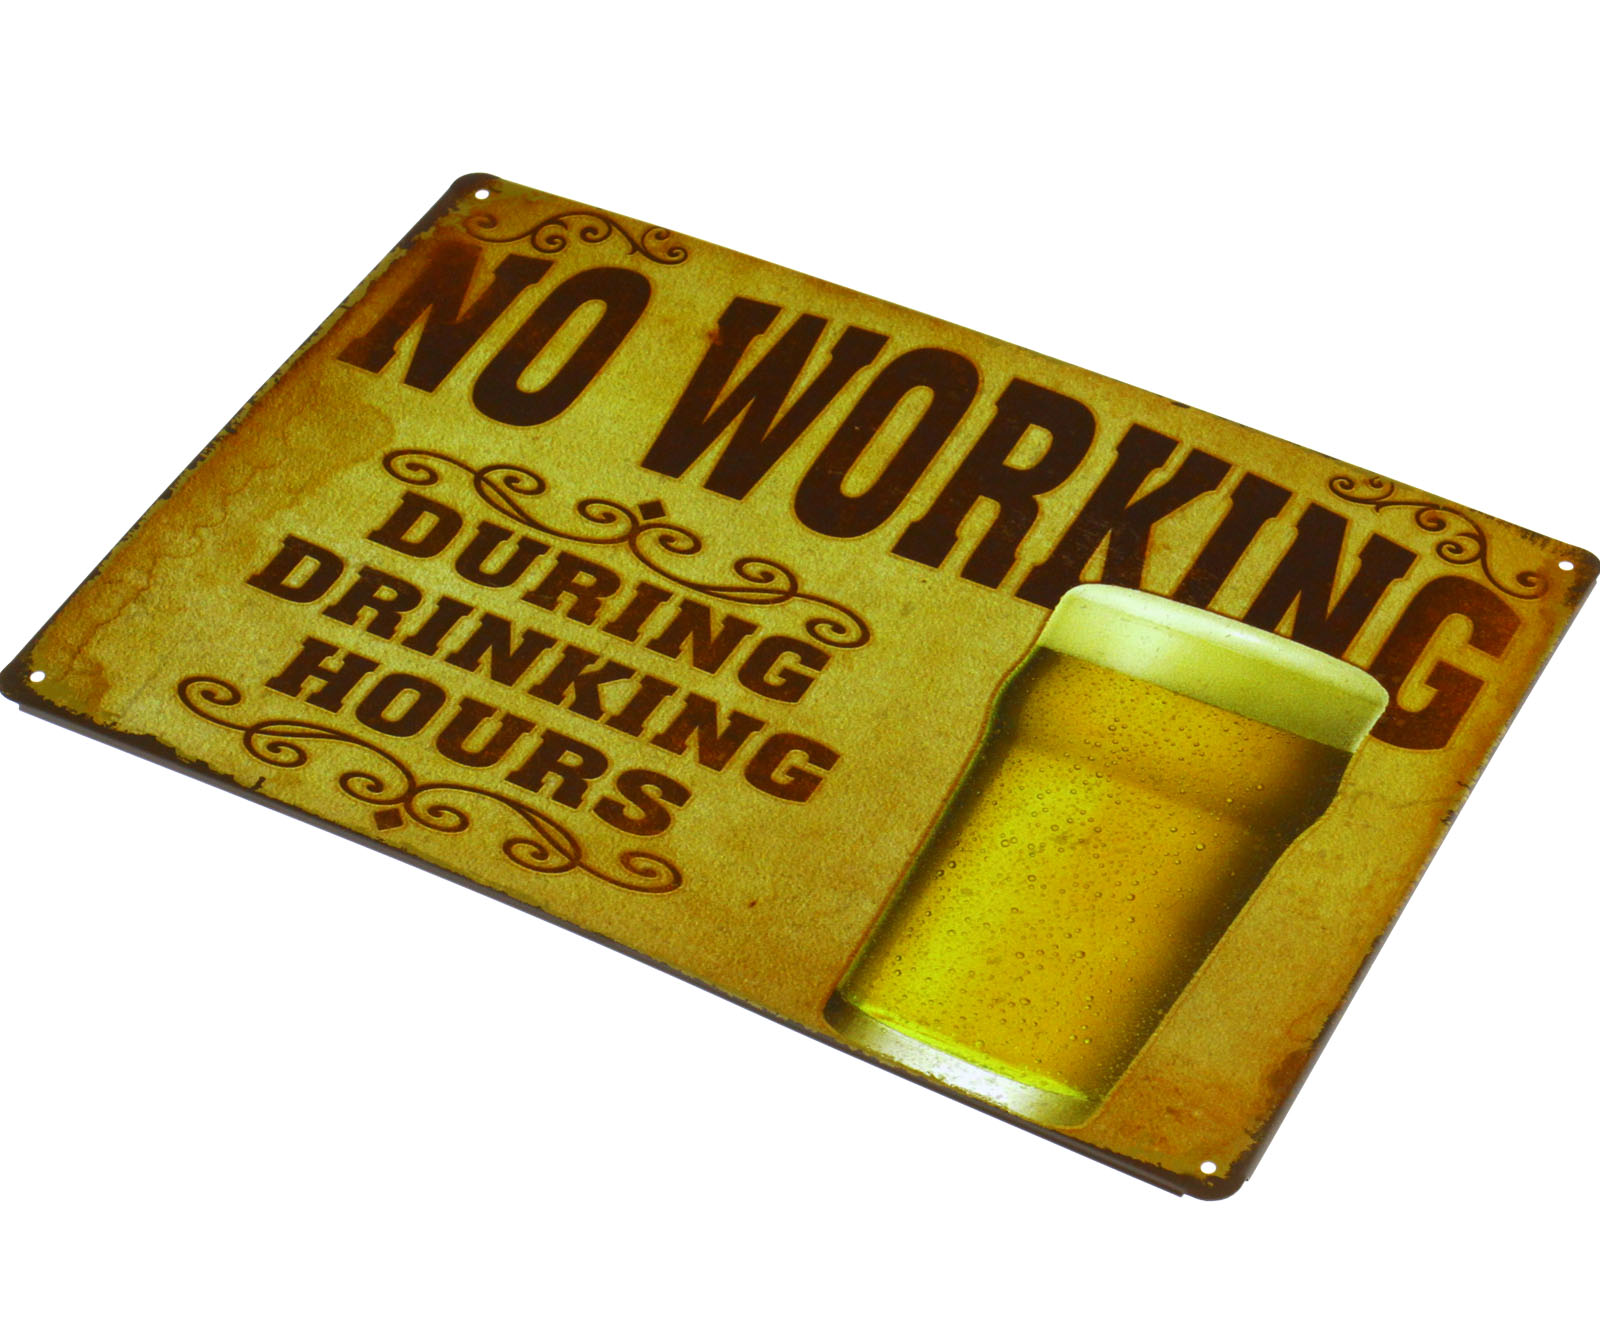 no working tin sign home room cafe pub garage bar wall decor metal poster plaque ebay. Black Bedroom Furniture Sets. Home Design Ideas